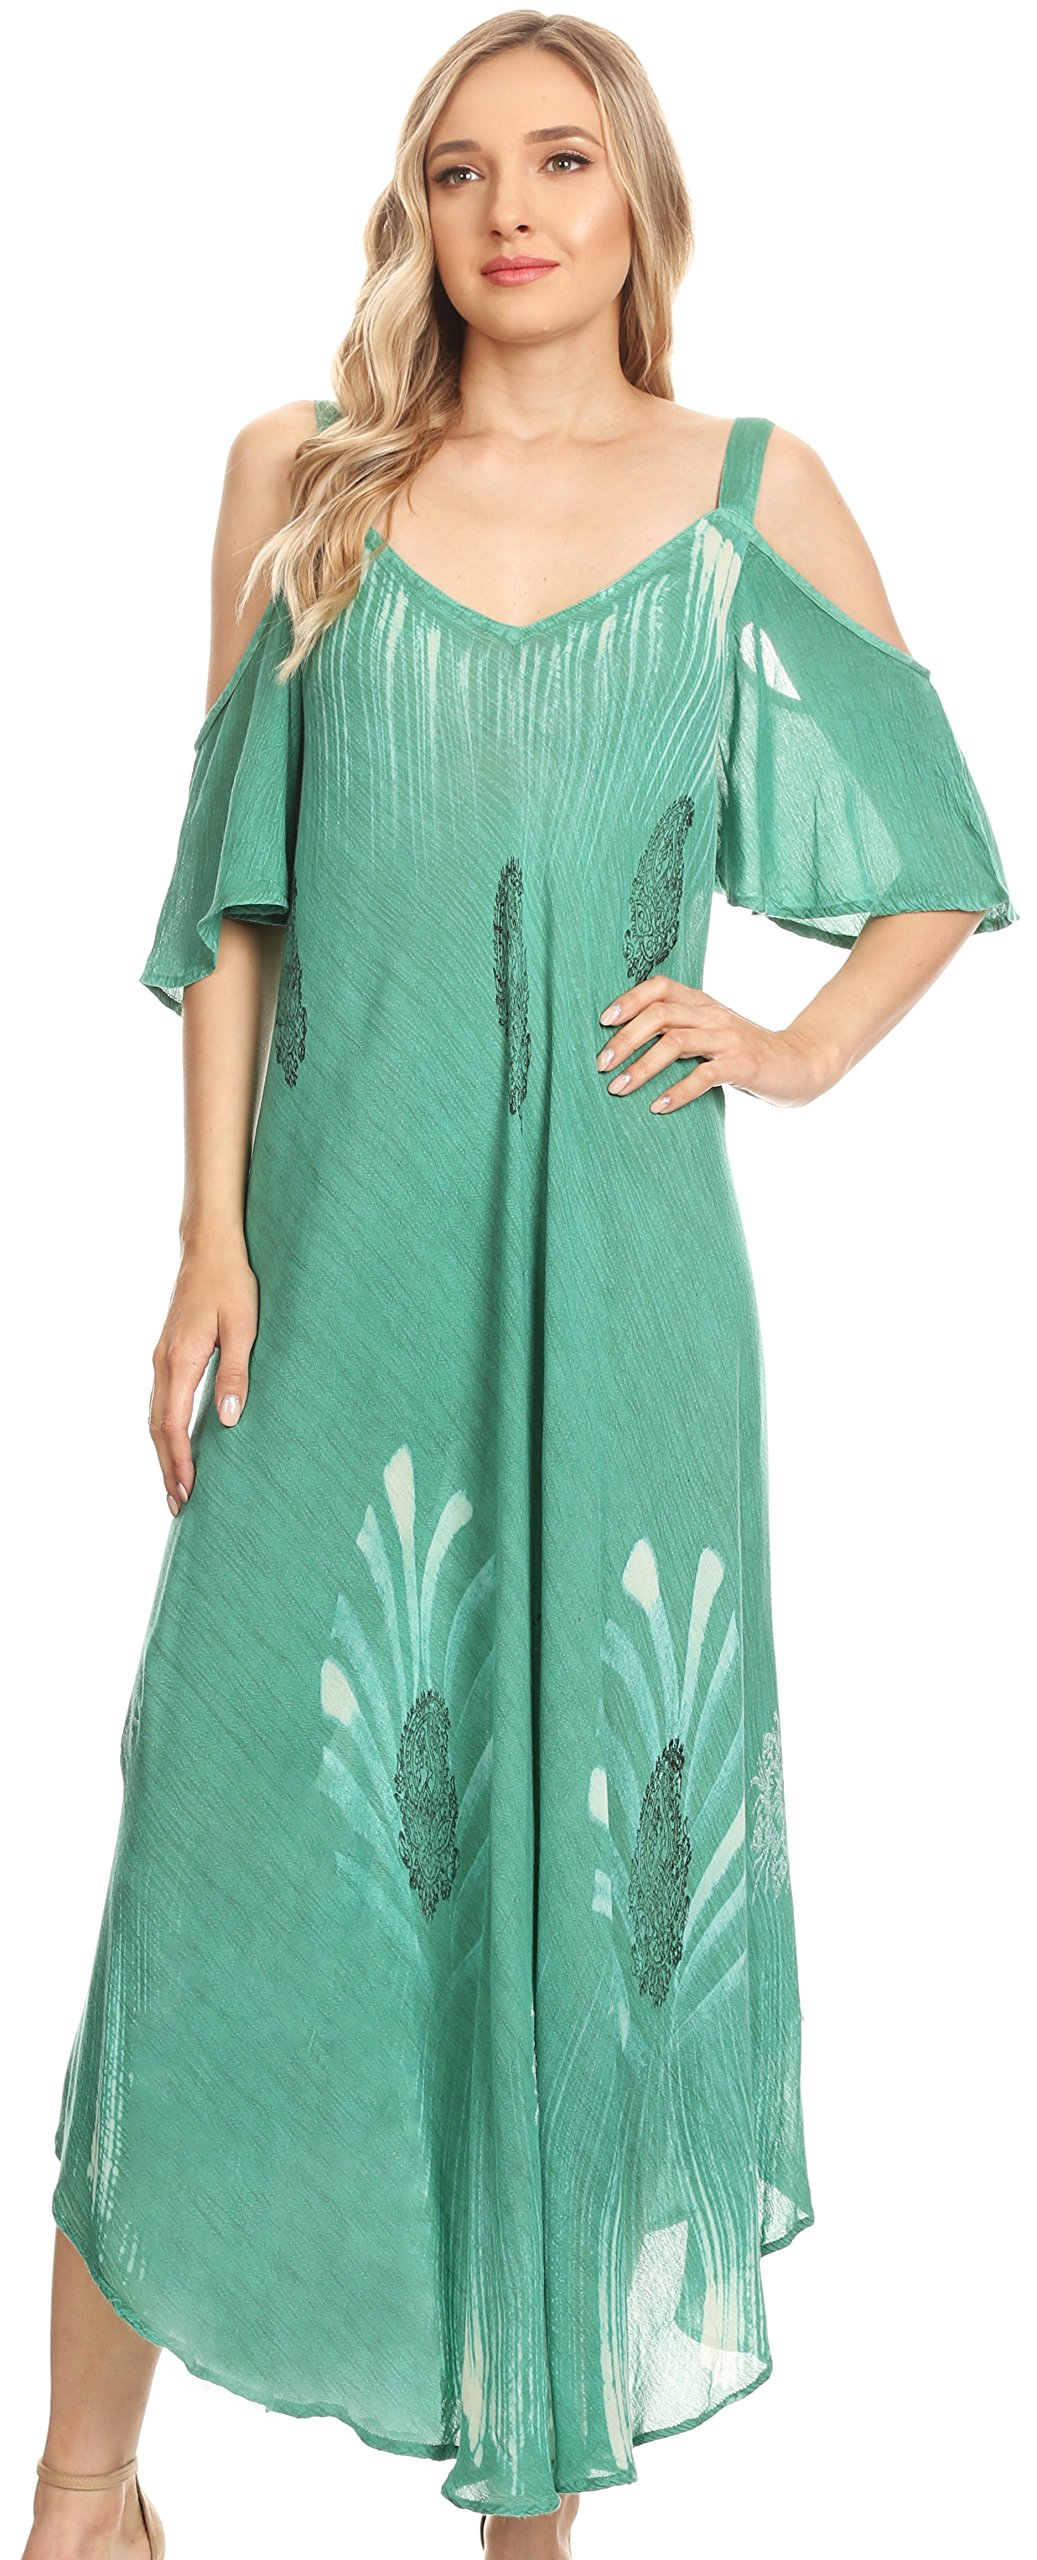 Sakkas 18155 - Renata Women's Cold Shoulder Maxi Caftan Dress Sundress Flare Stonewashed - Aqua - OS by Sakkas (Image #5)